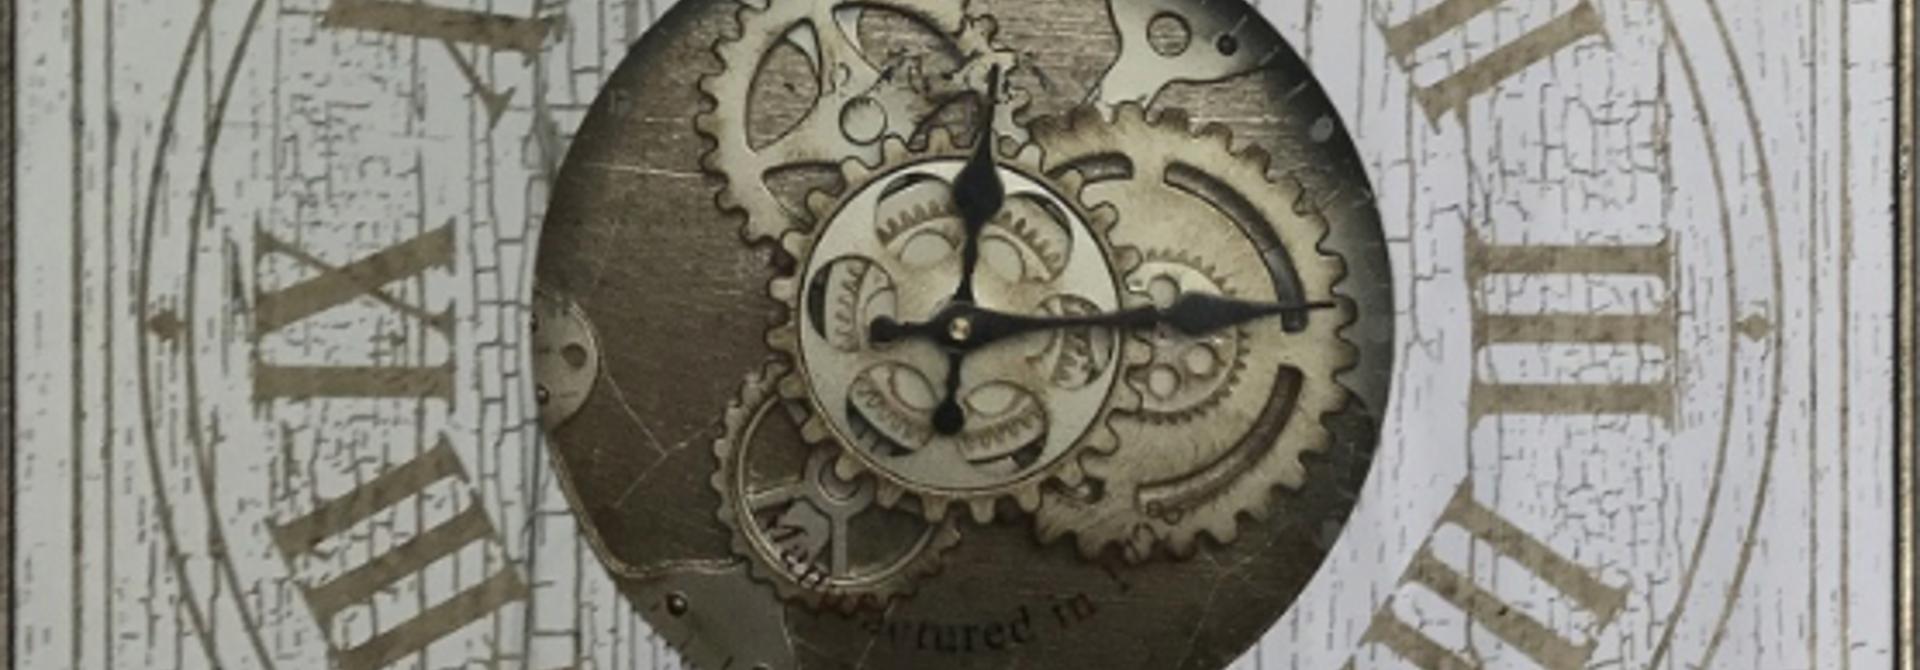 FANCY - Cabret Wall Clock 60cm